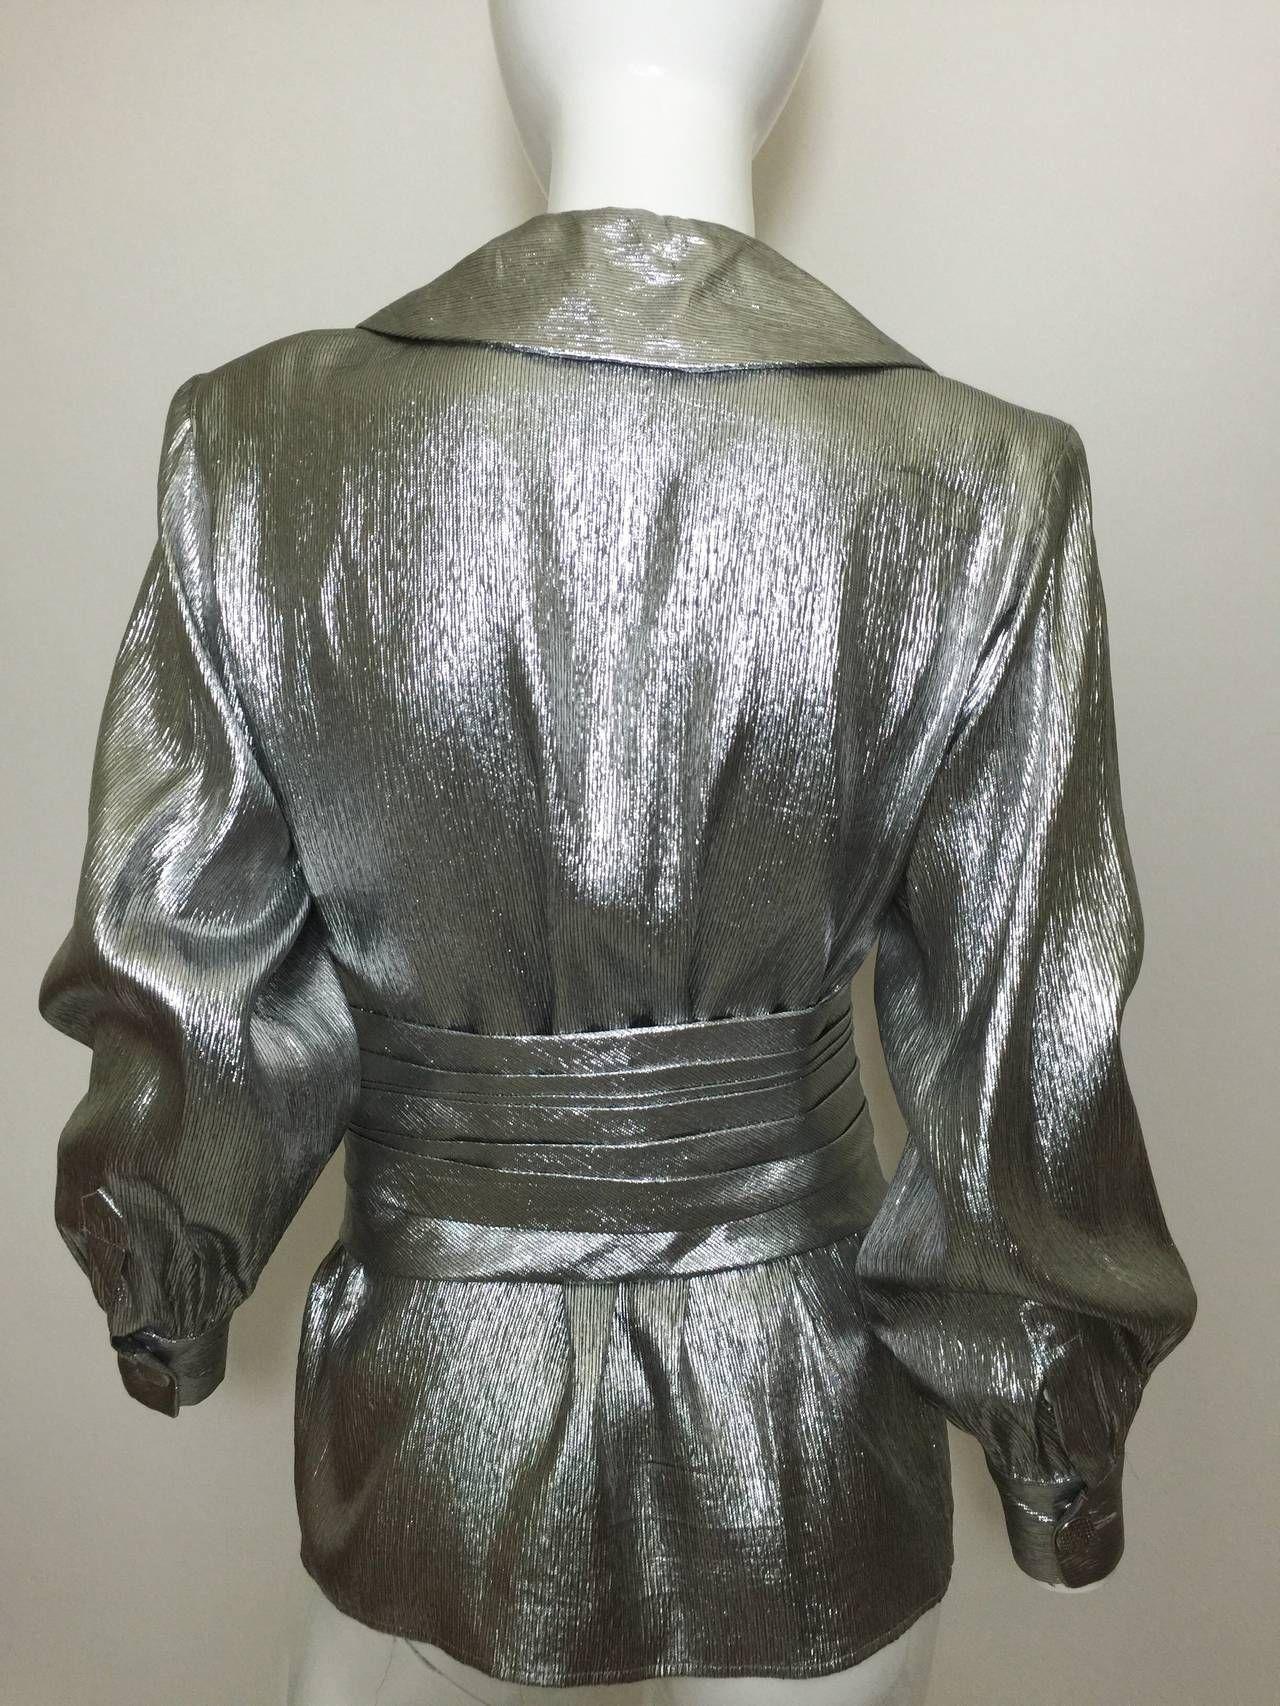 249b96da9ba Vintage Saint Laurent Metallic Silver Blouse & Cumberbund Belt YSL image 3